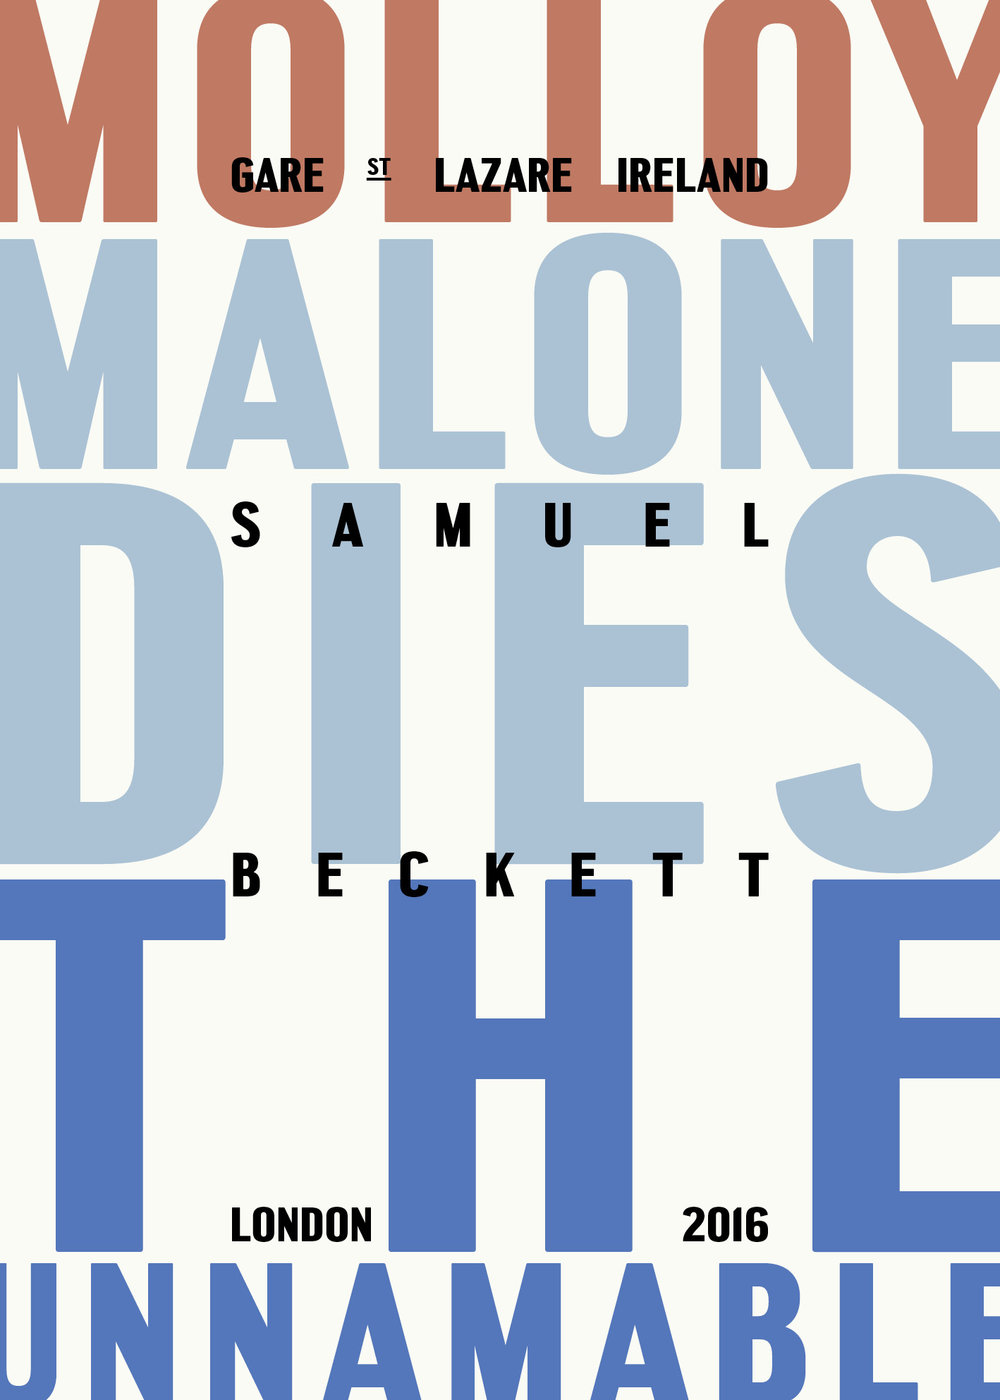 Beckett_Molloy_Malone_Unname_London.jpg